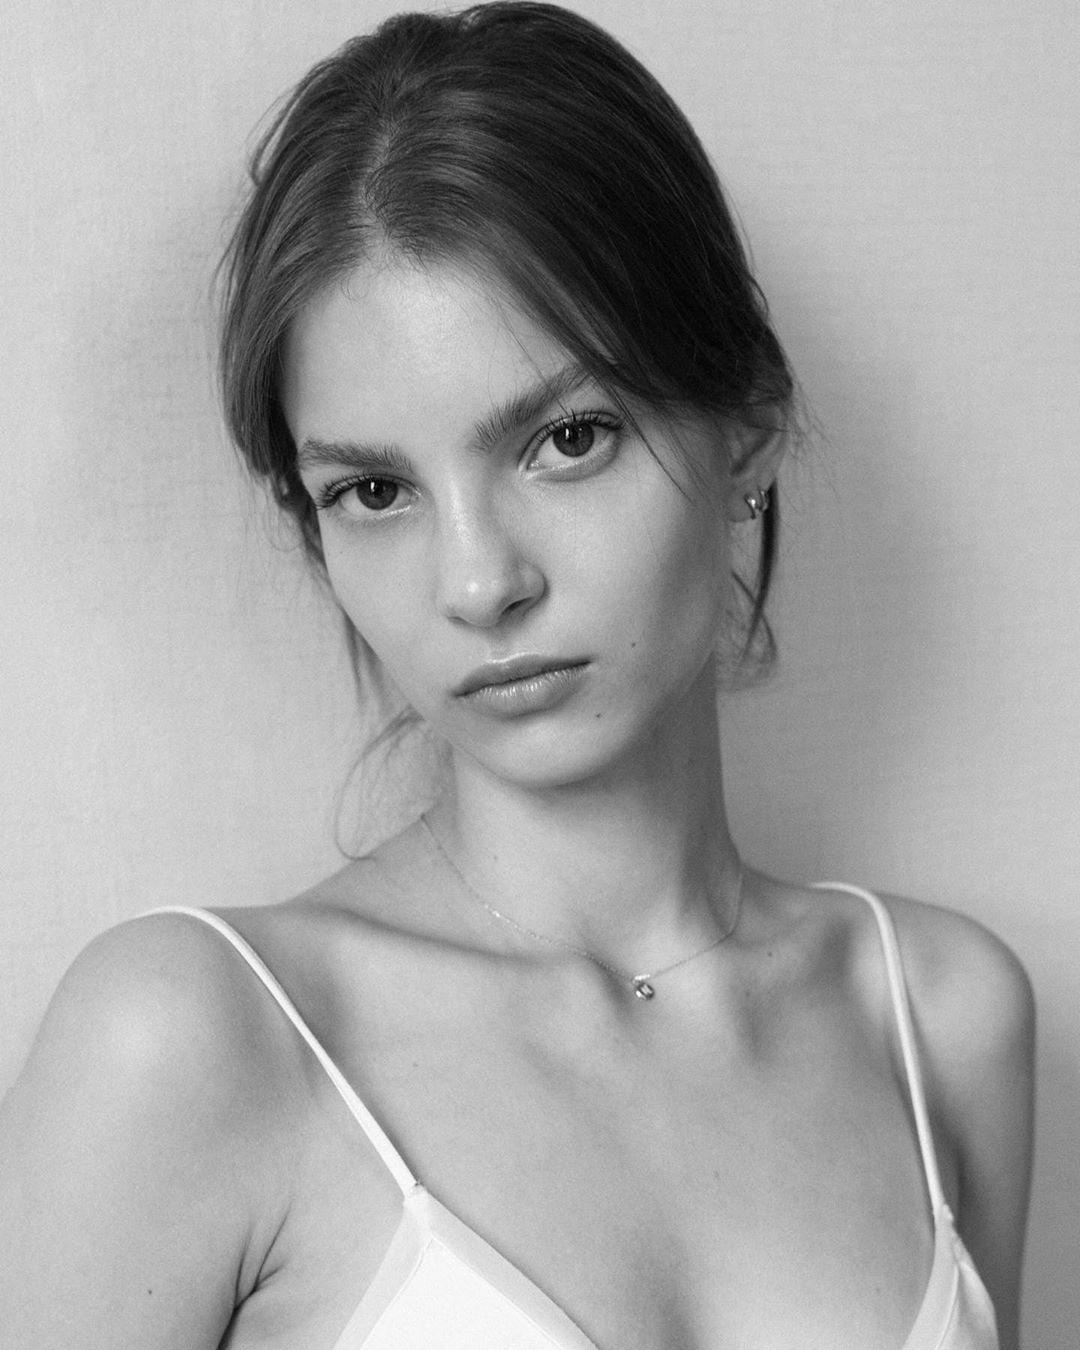 Nastya Zhuleva by Dzijana Papleuka